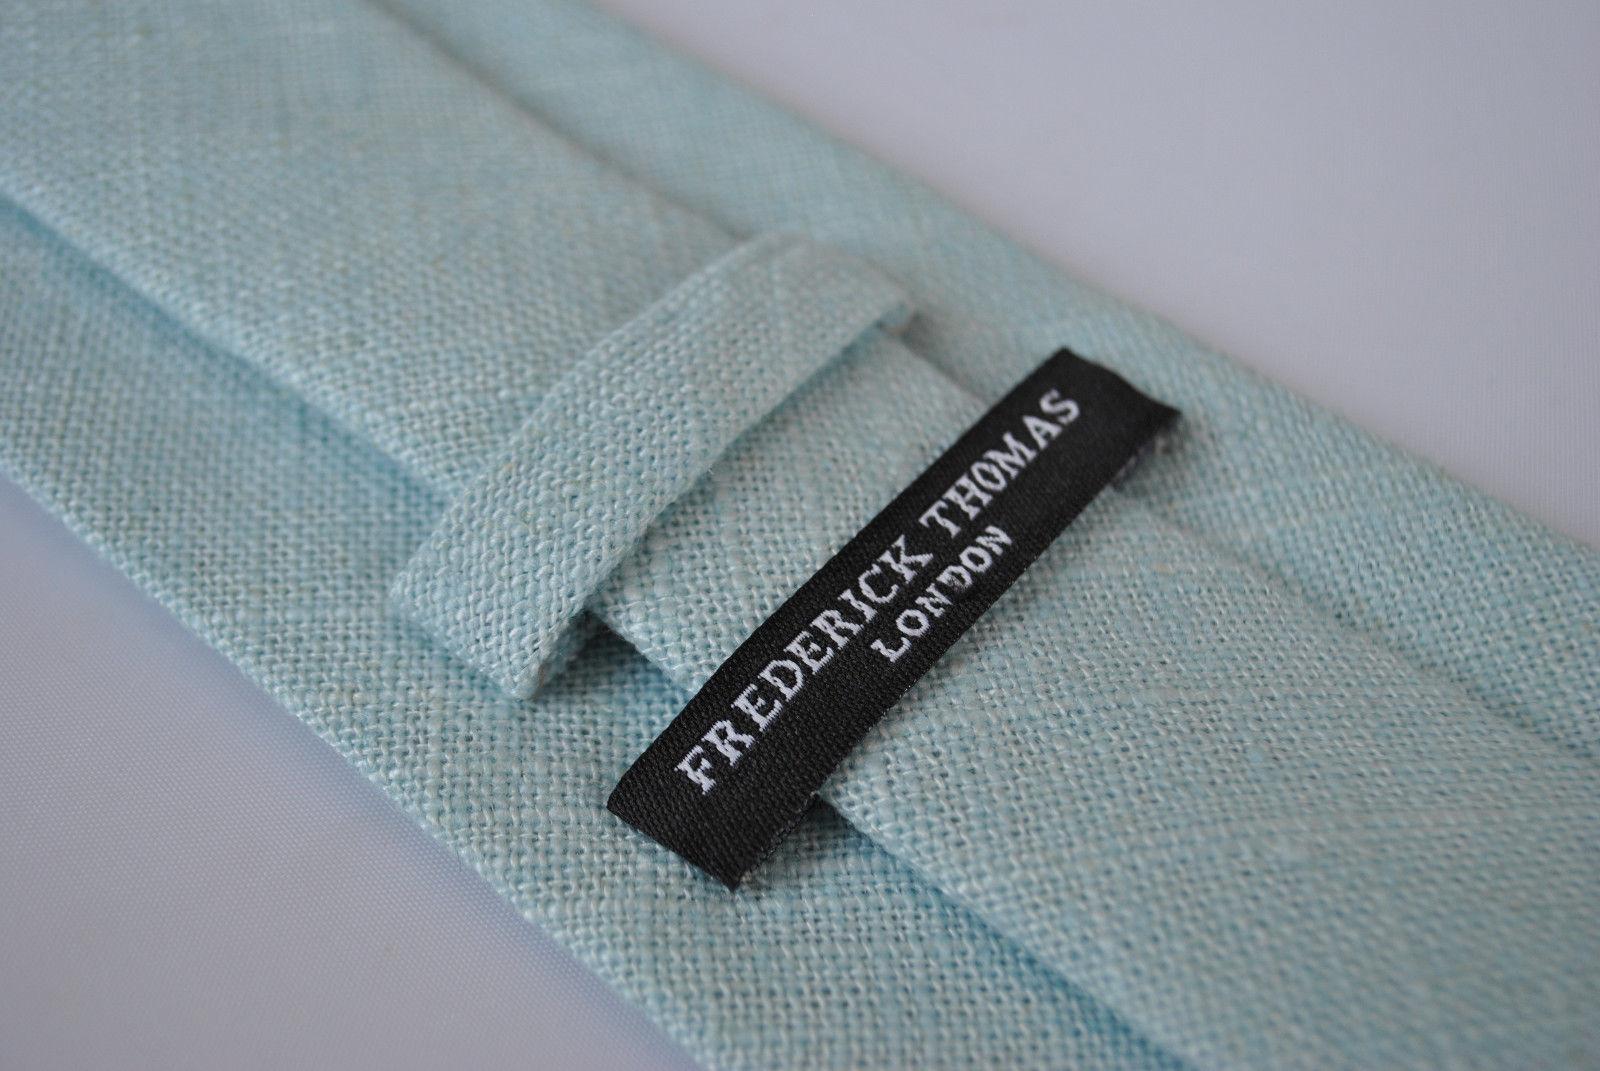 Frederick Thomas duck egg blue textured linen tie FT1964